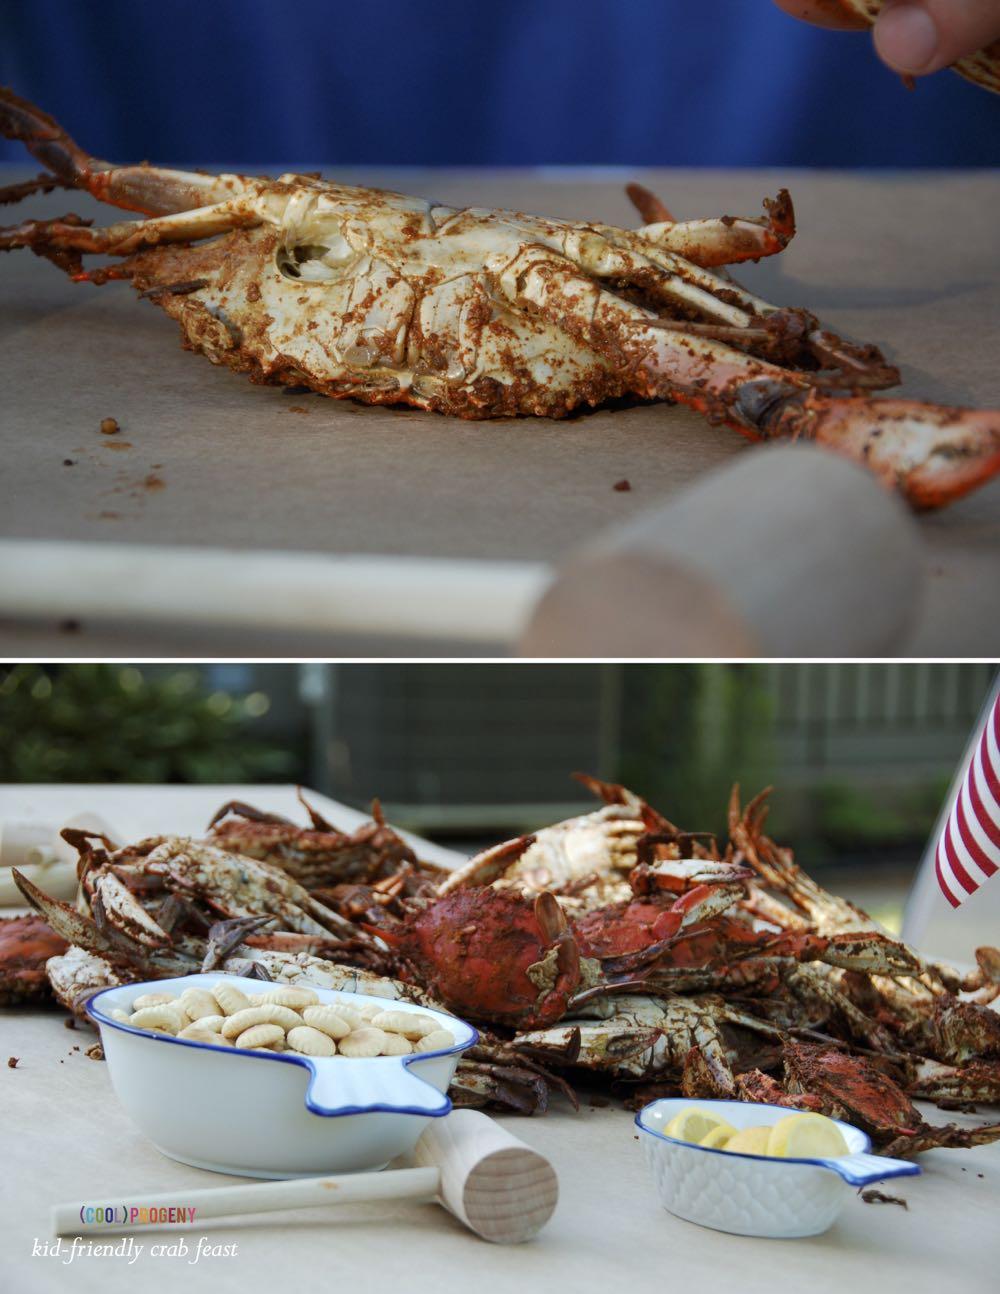 Kid-Friendly Crab Feast - (cool) progeny